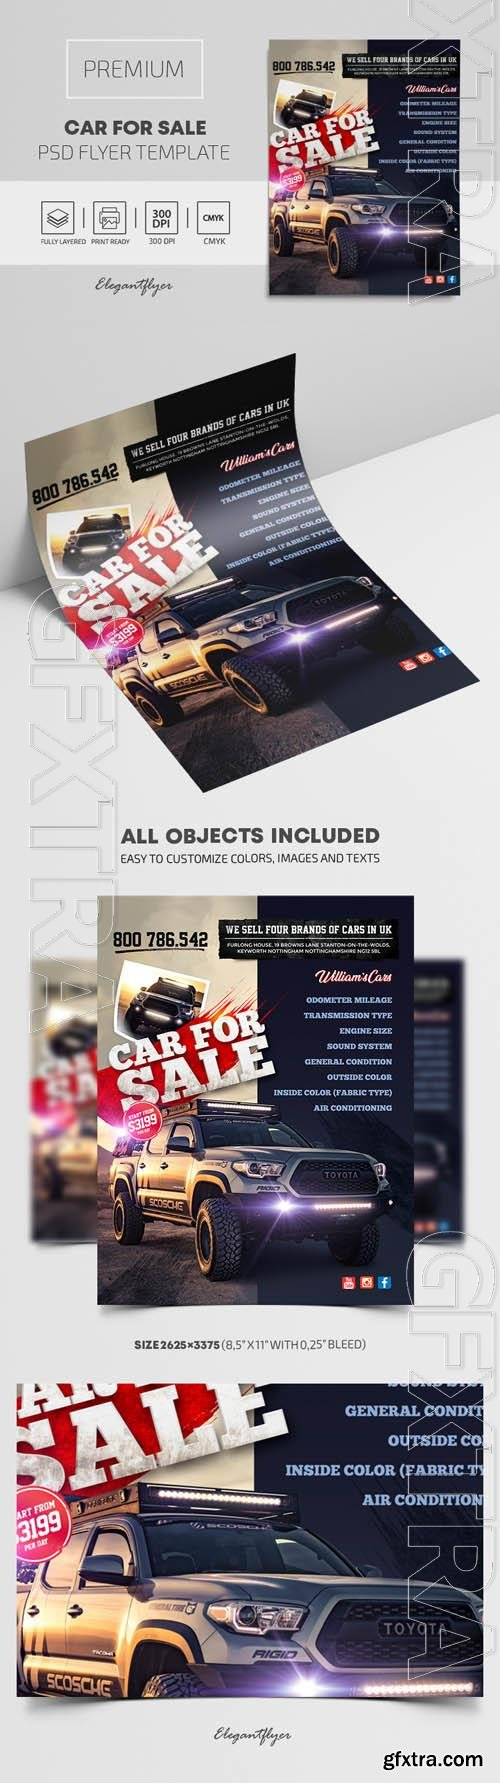 Car For Sale Premium PSD Flyer Template